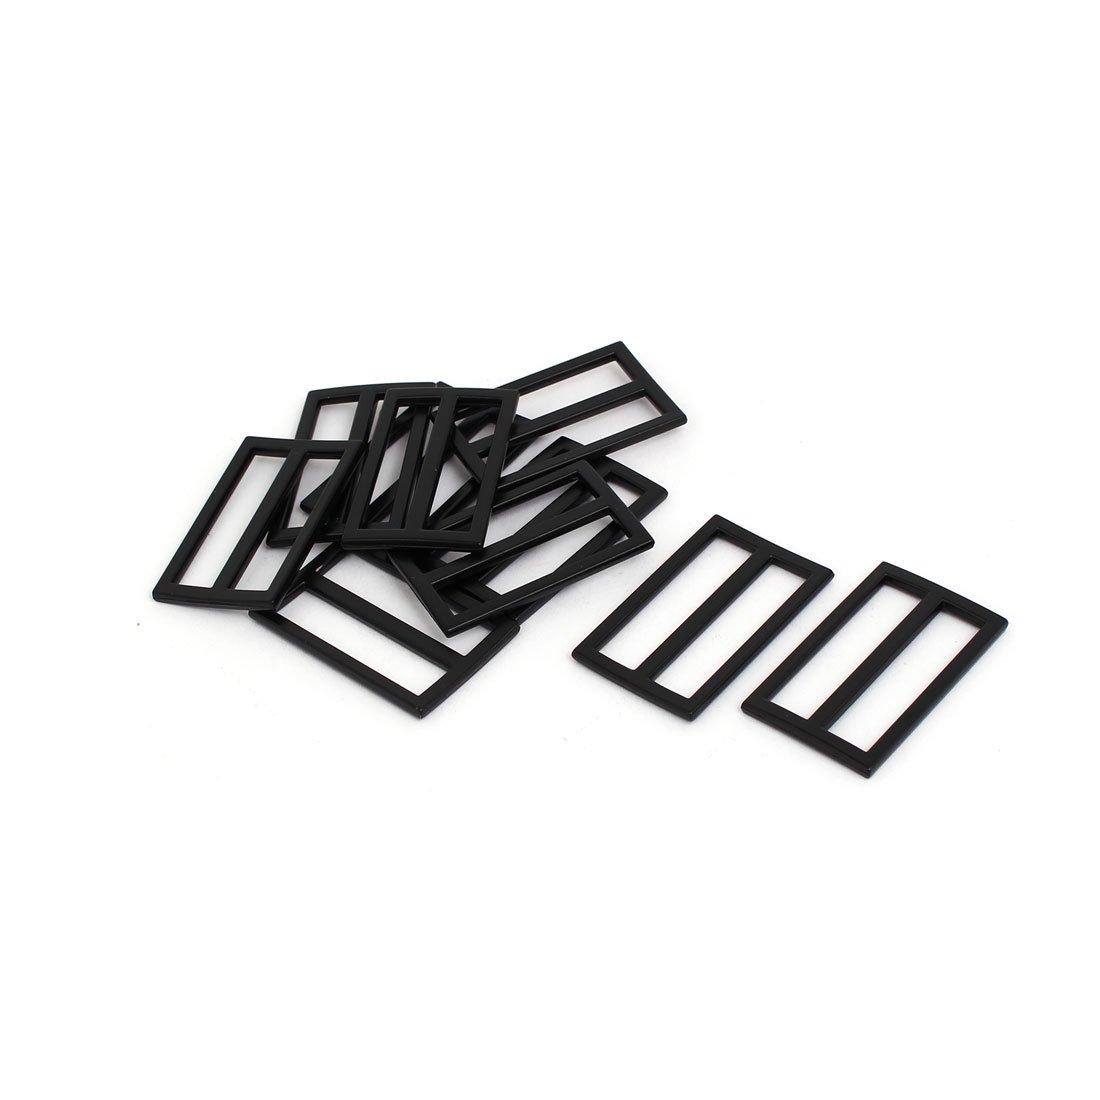 sourcing map 45mmx27mmx3mm Cinturino montabile regolabile Slitta Chiusura valigia/Borsa nera 10pz